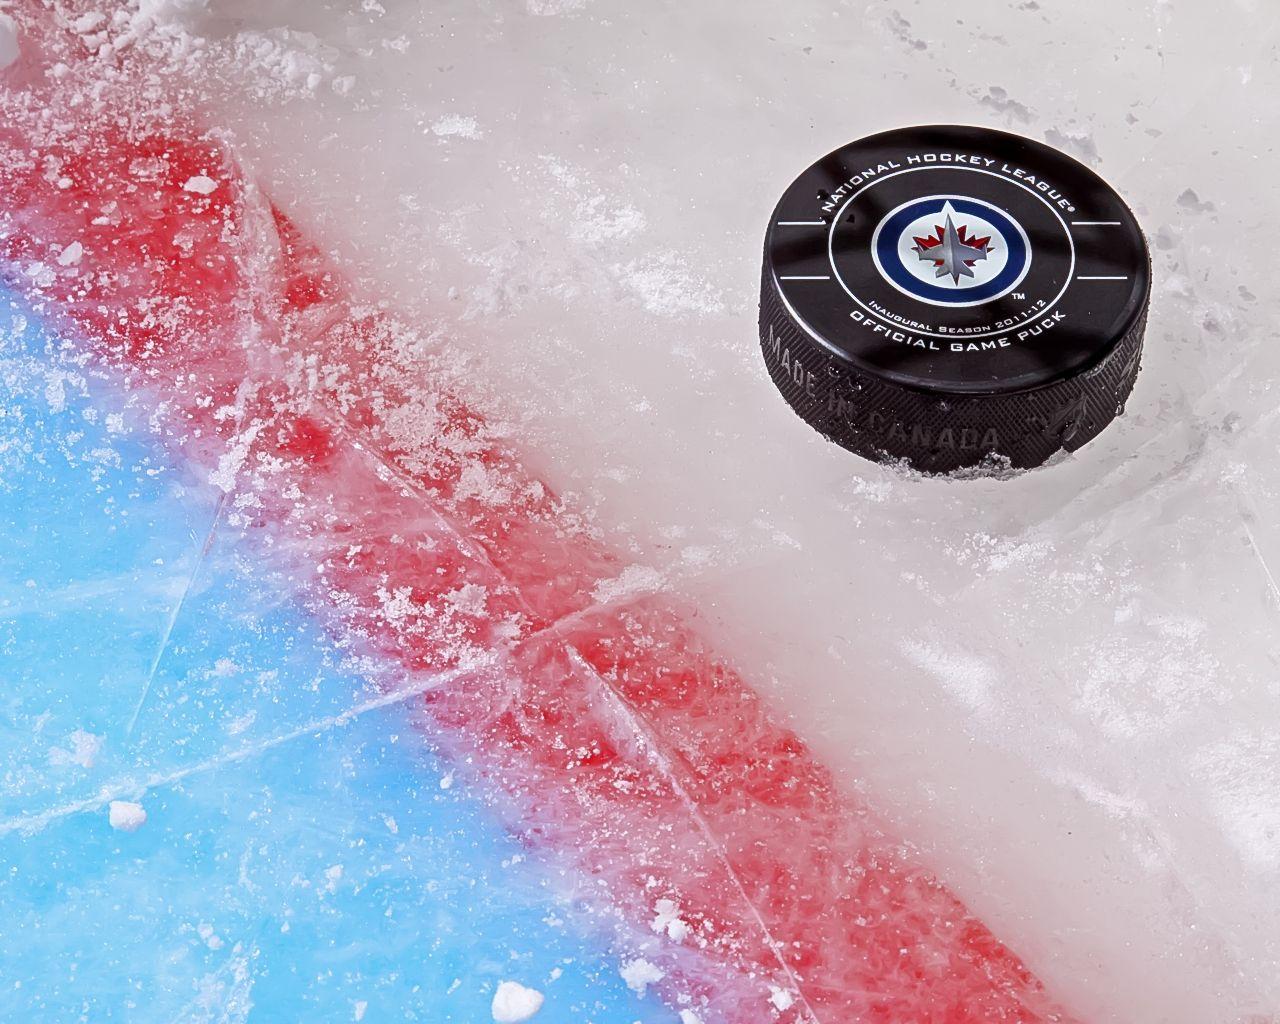 Check out more great Winnipeg Jets wallpapers on www.winnipegjets.com